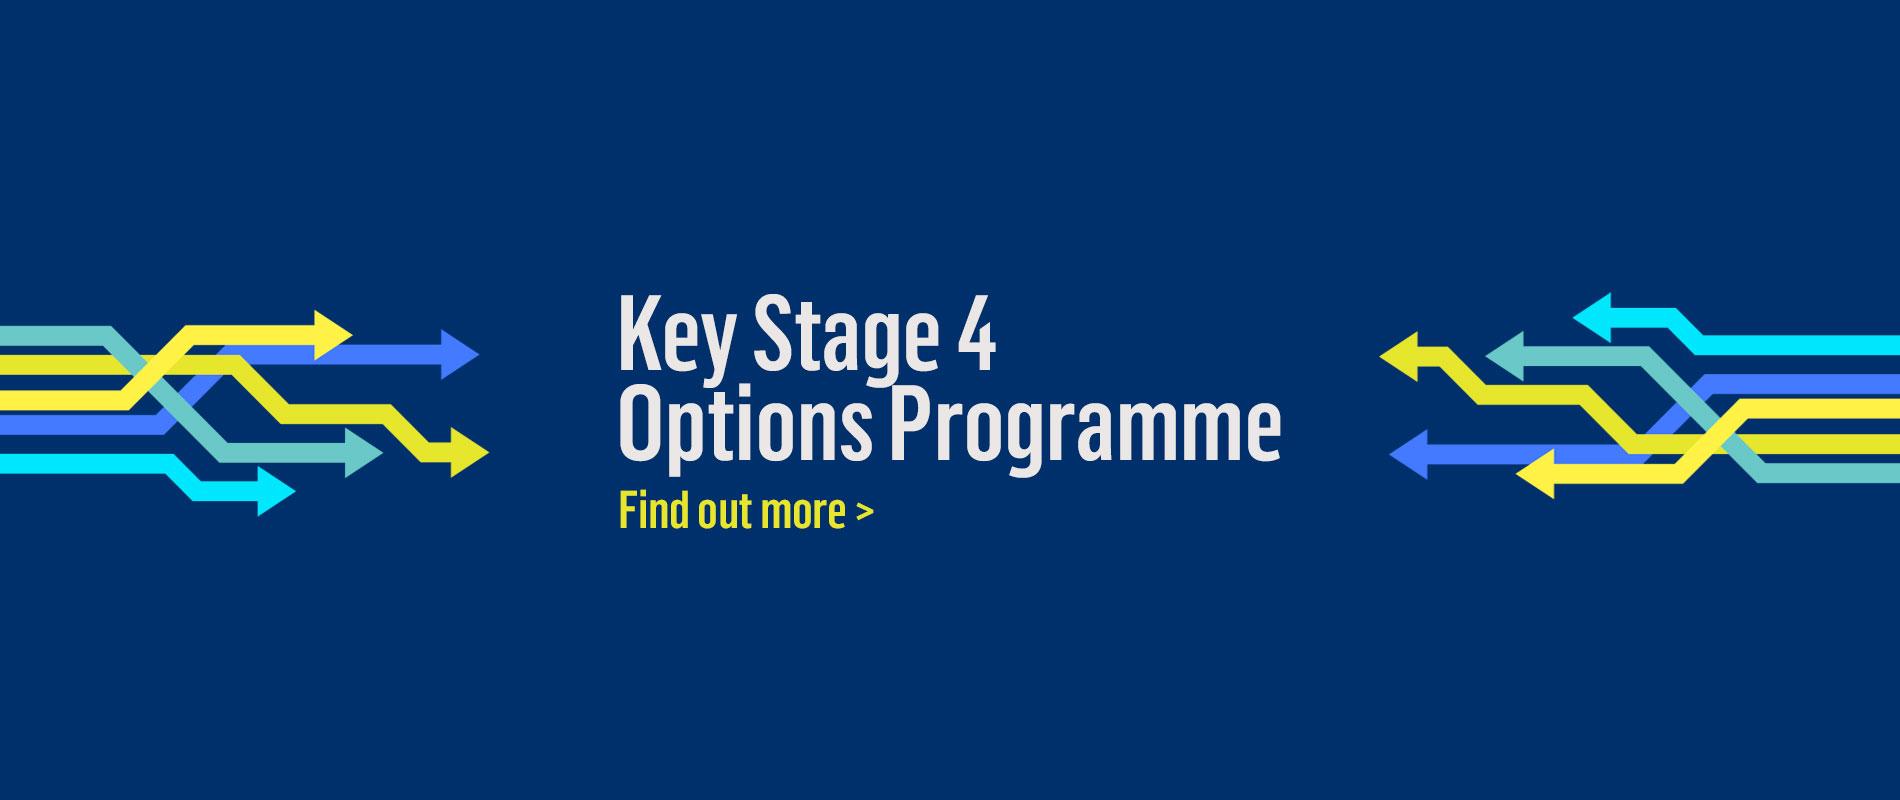 COA10759_OptionsProgramme_Slider